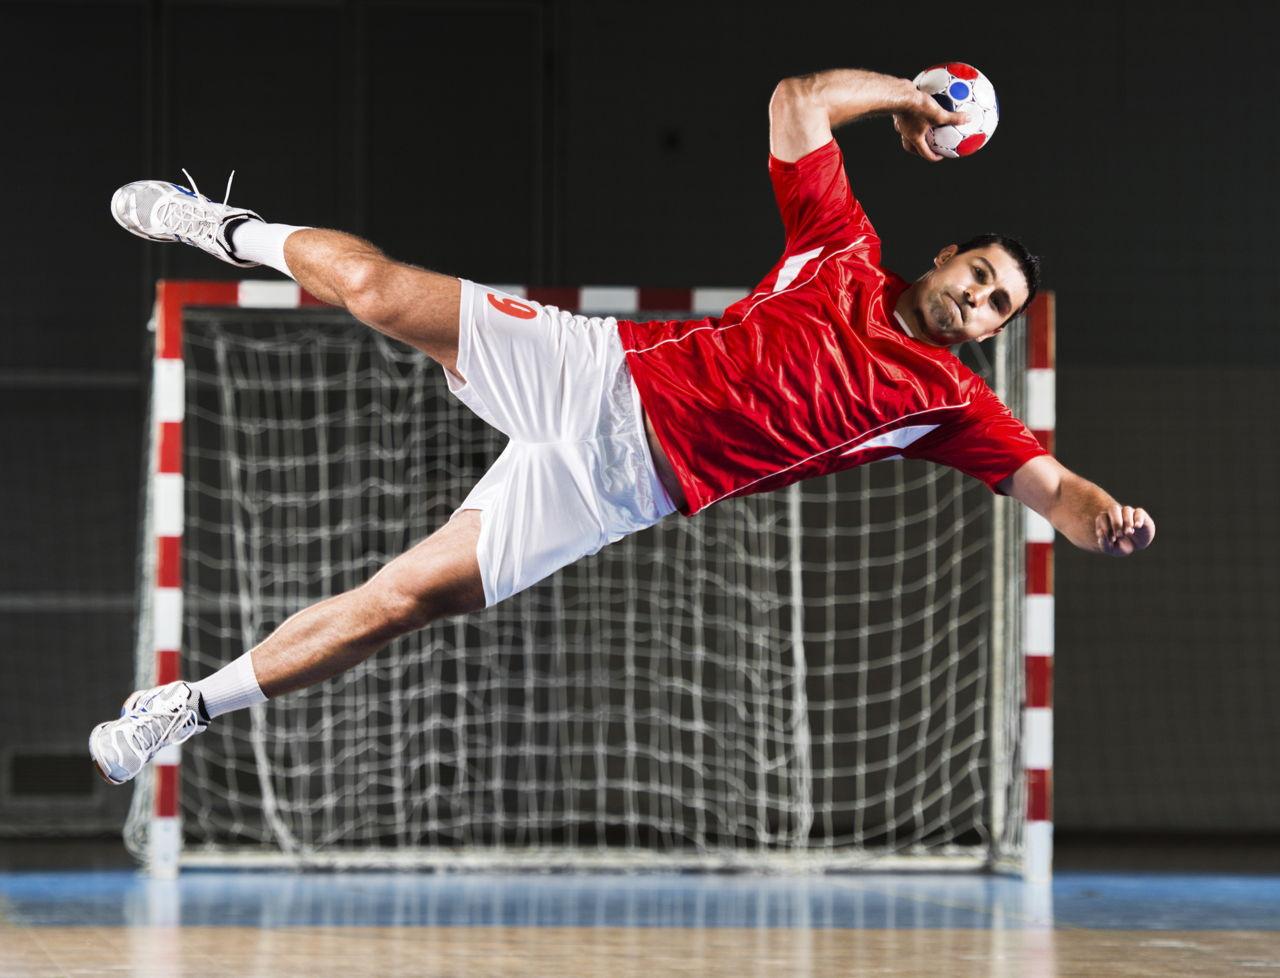 Handball Rules And Regulations